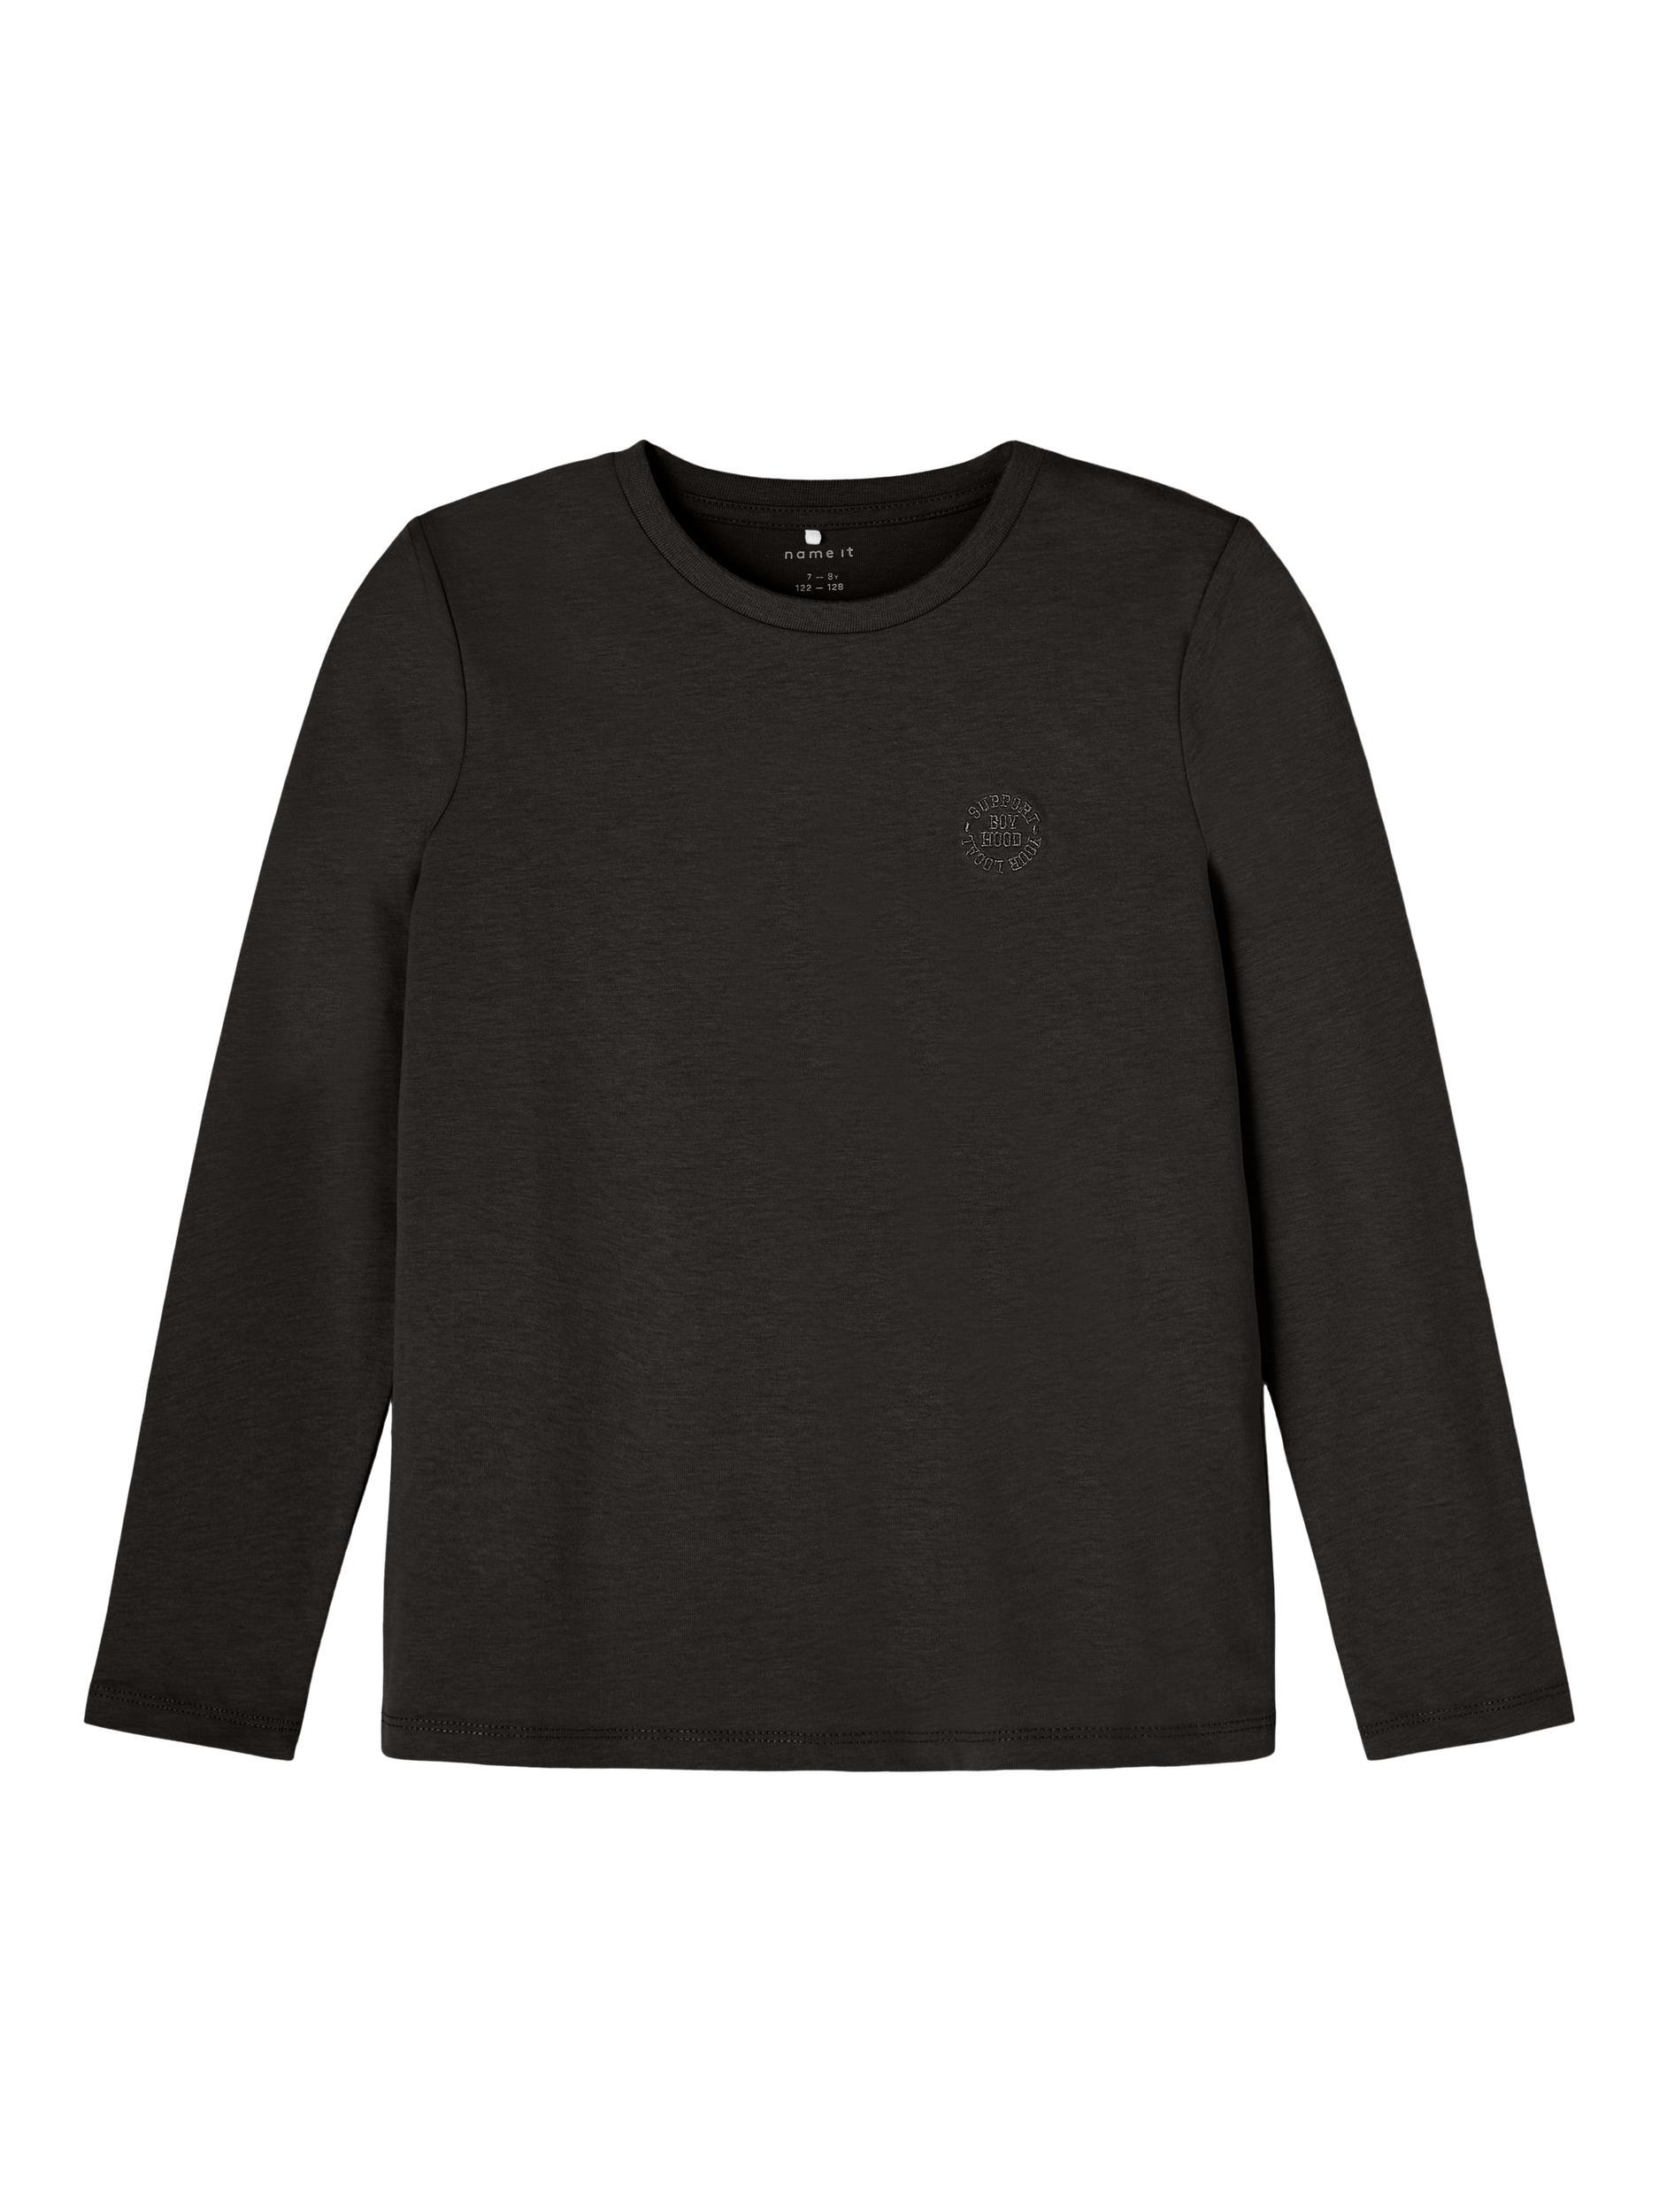 Name It Tano LS top, Black, 134-140